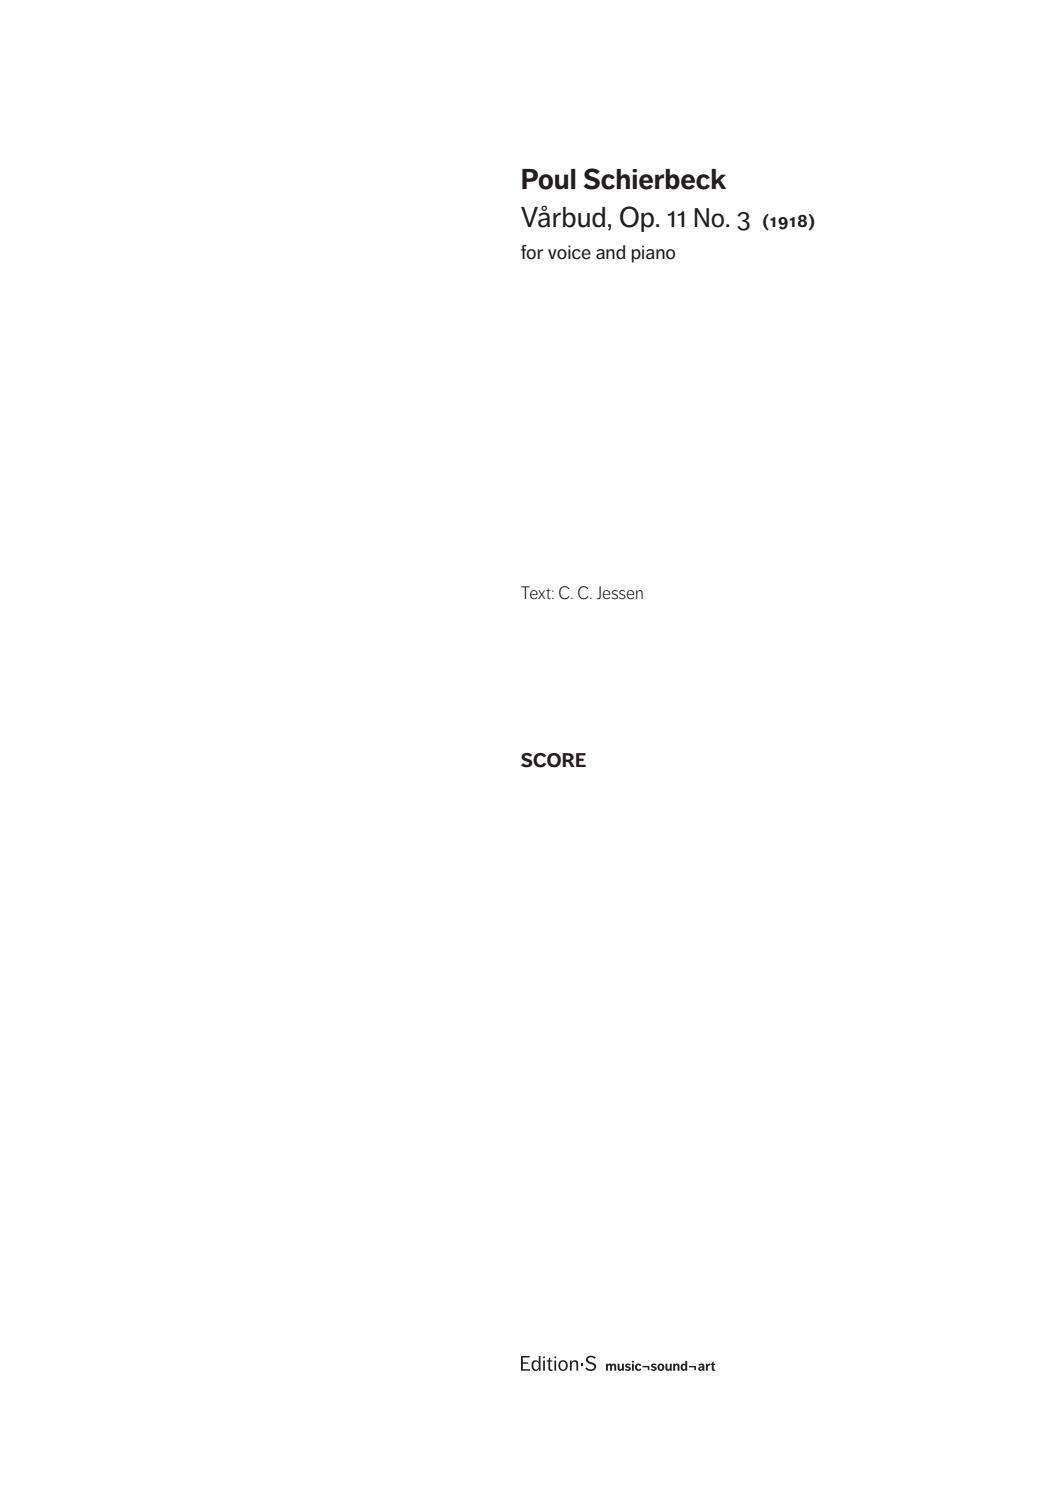 Poul Schierbeck: Vårbud by Edition·S – music¬sound¬art - issuu